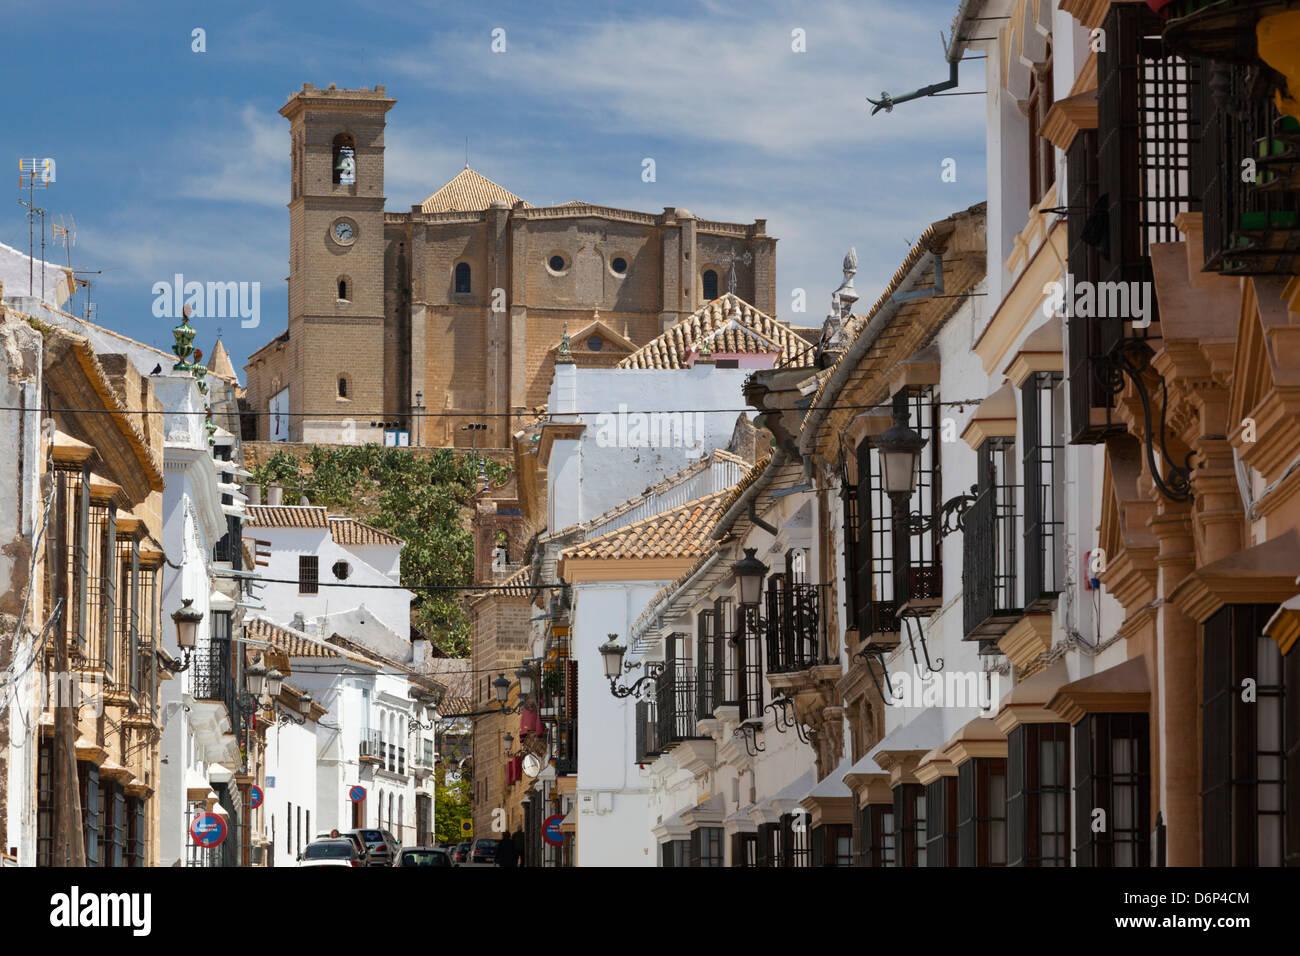 Renaissance houses and 16th century La Colegiata, Osuna, Andalucia, Spain, Europe - Stock Image